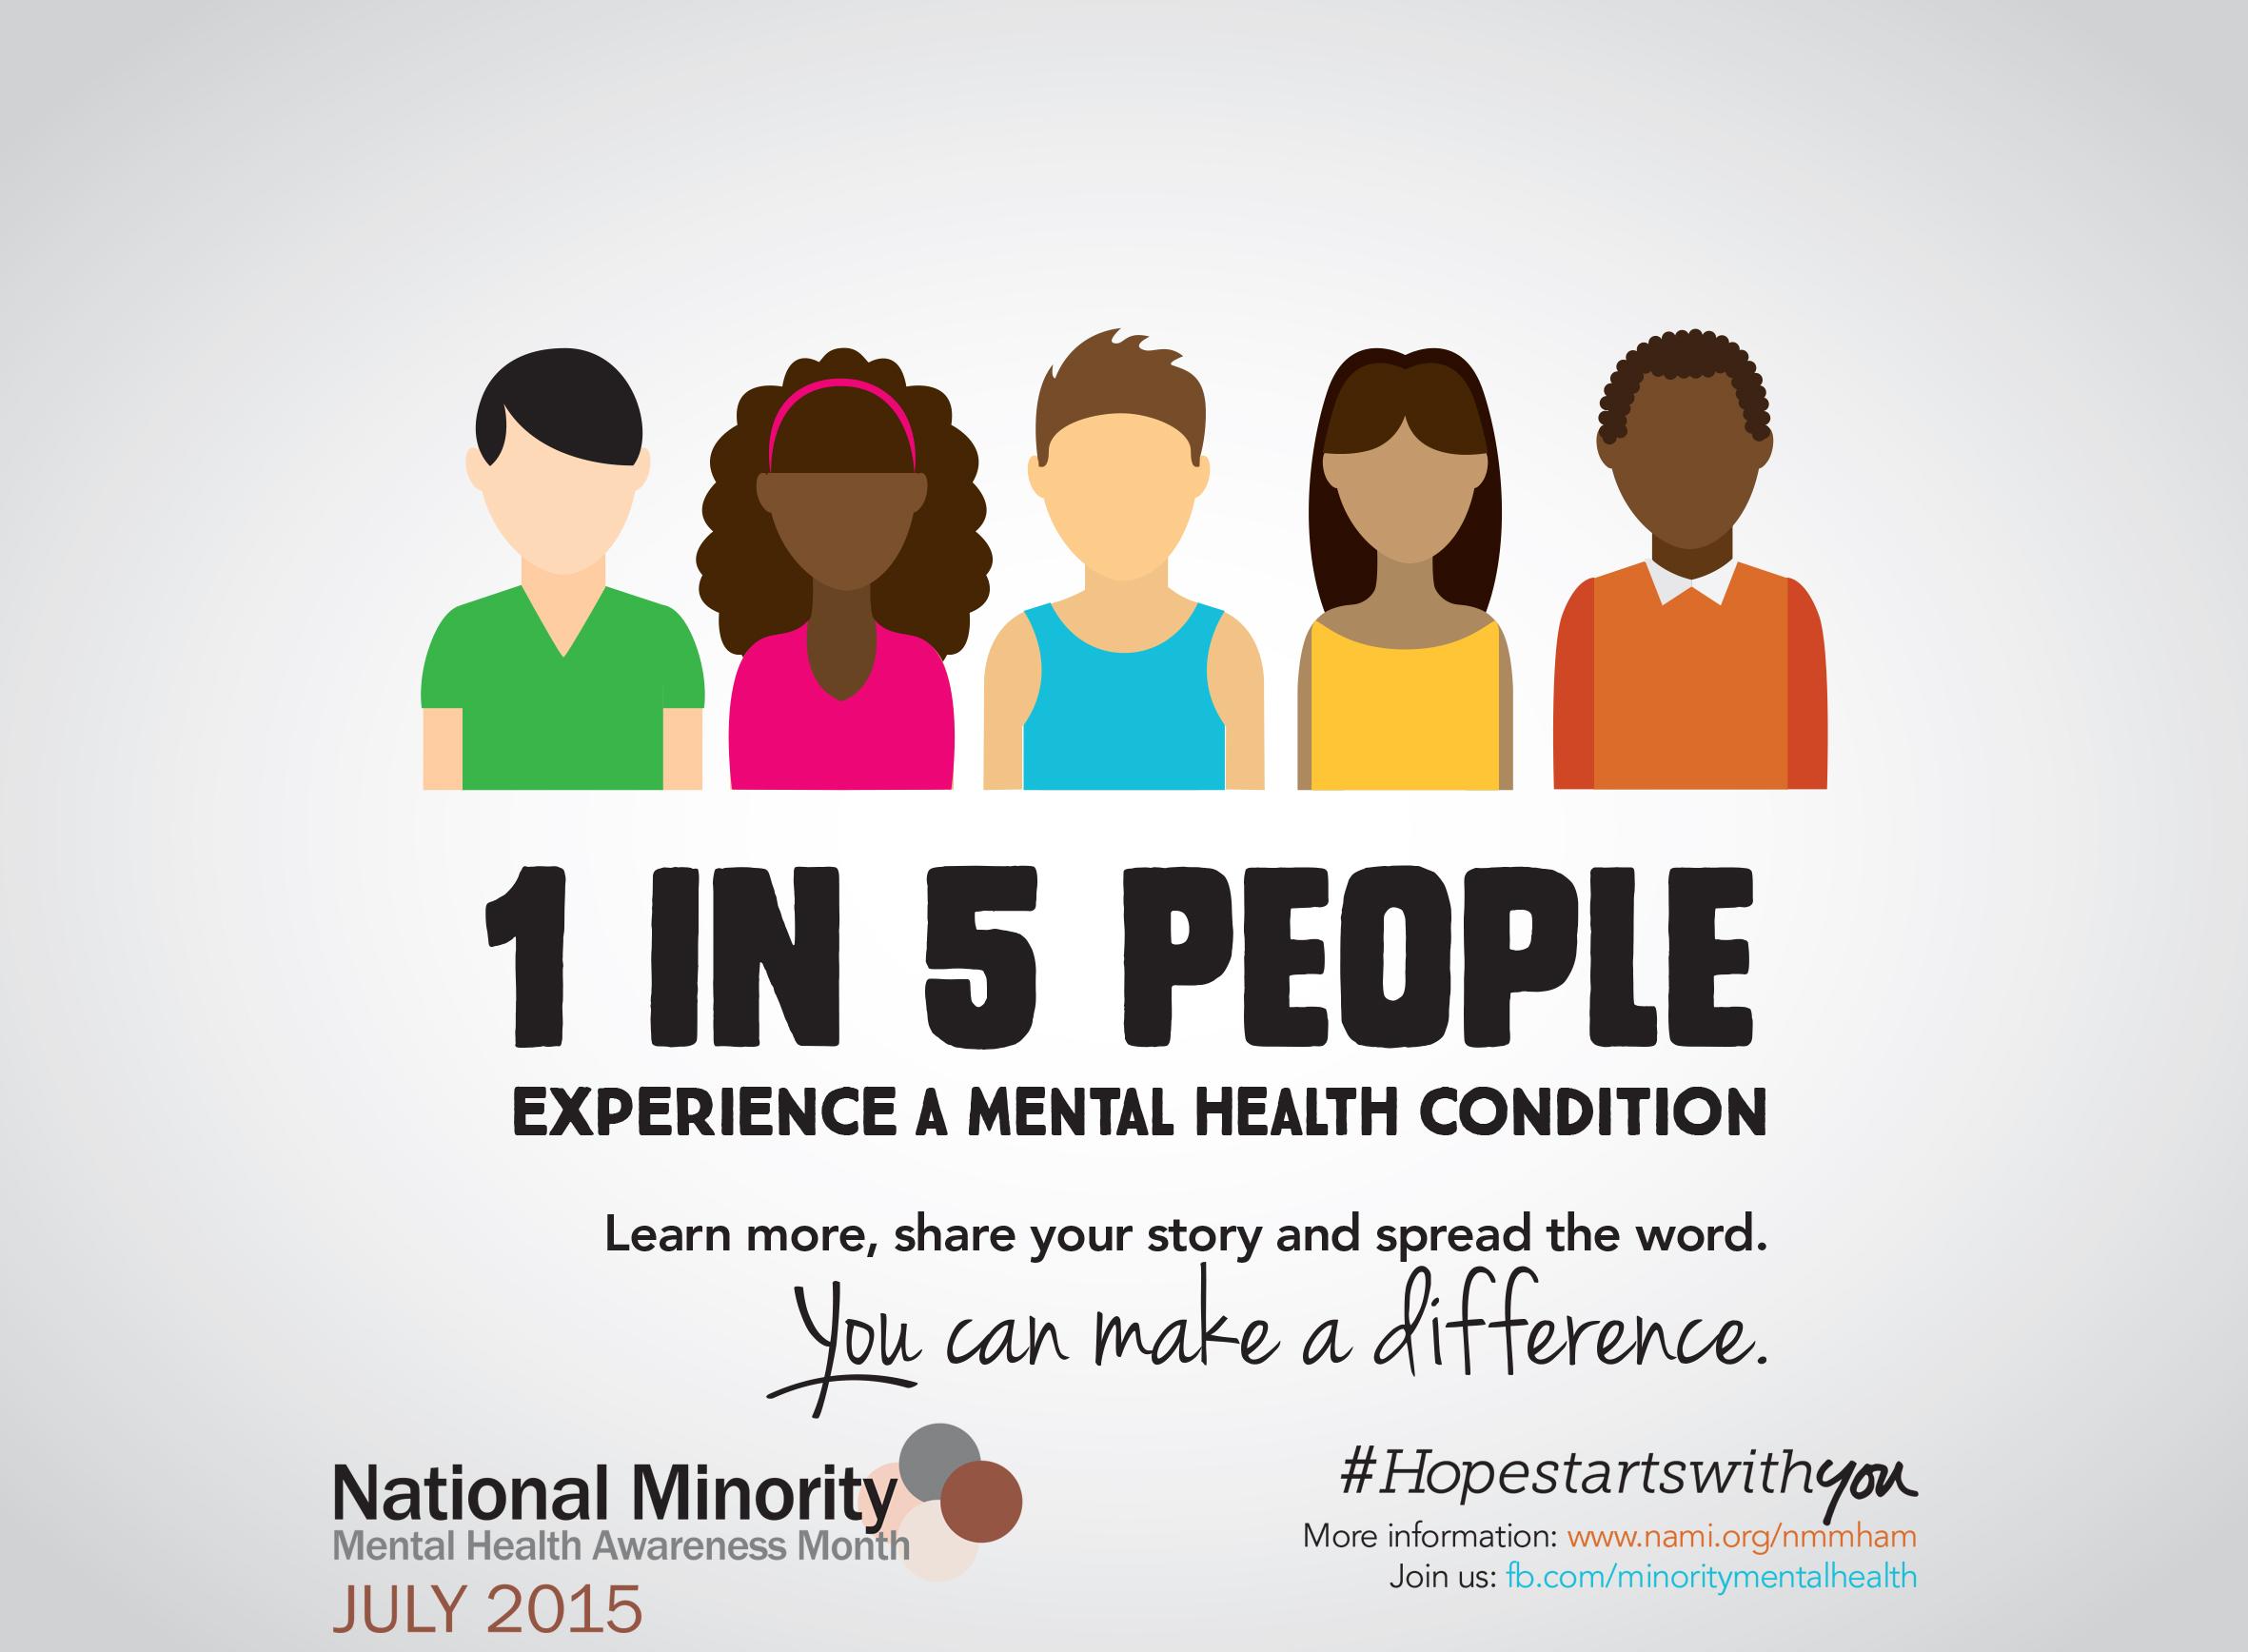 July National Minority Mental Health Awareness Month